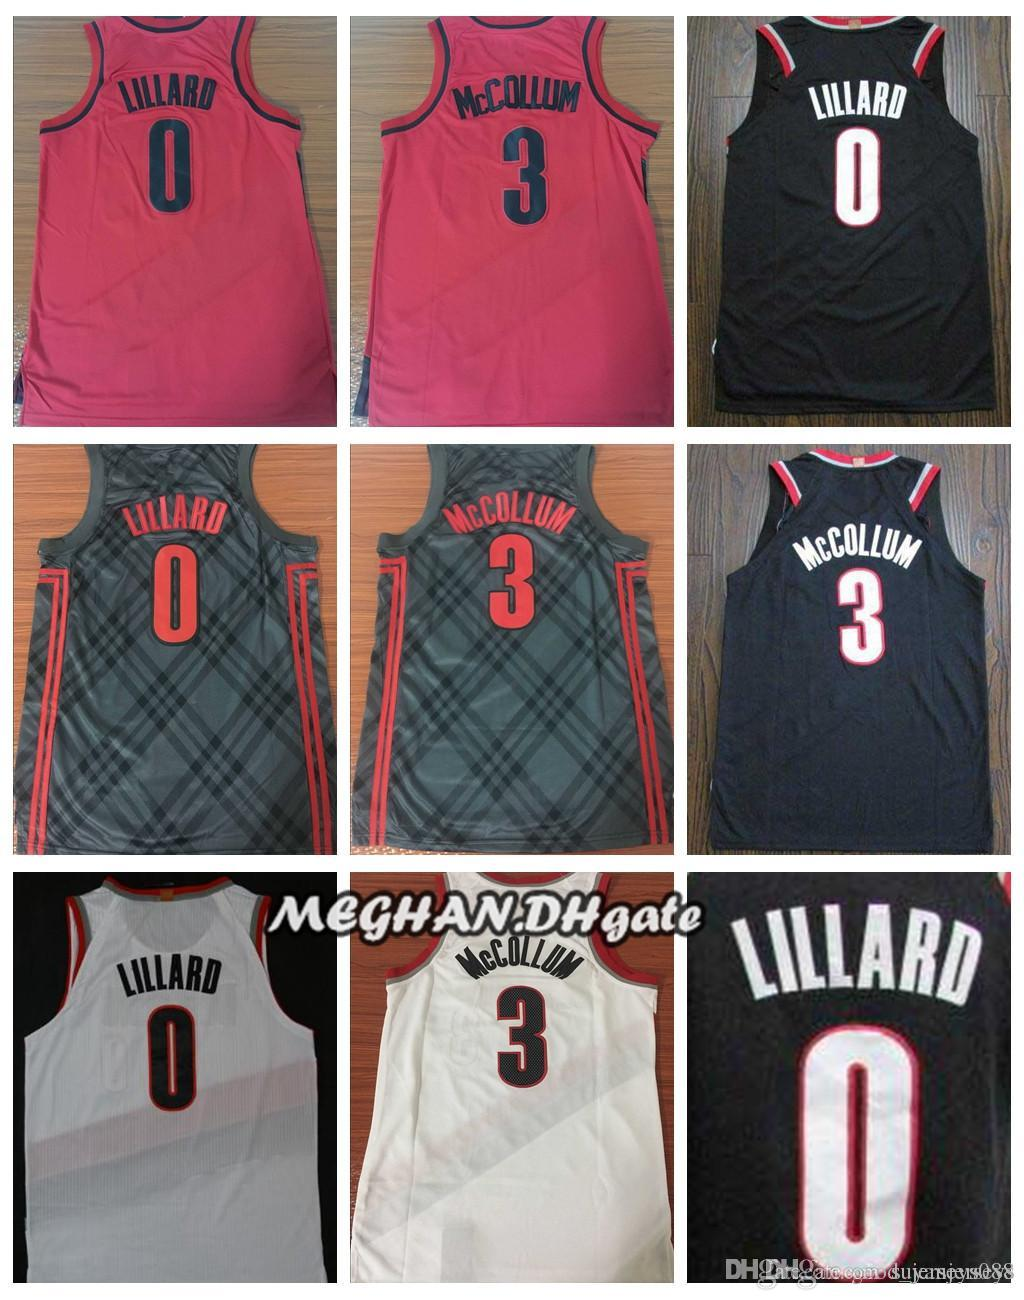 28f5ab863 2019 2018 Men  0 Damian City Jerseys Lillard Embroidery Splice Cheap 3  CJ  McCollum All Stitched RipCity Lillard Basketball Jersey Suture From ...